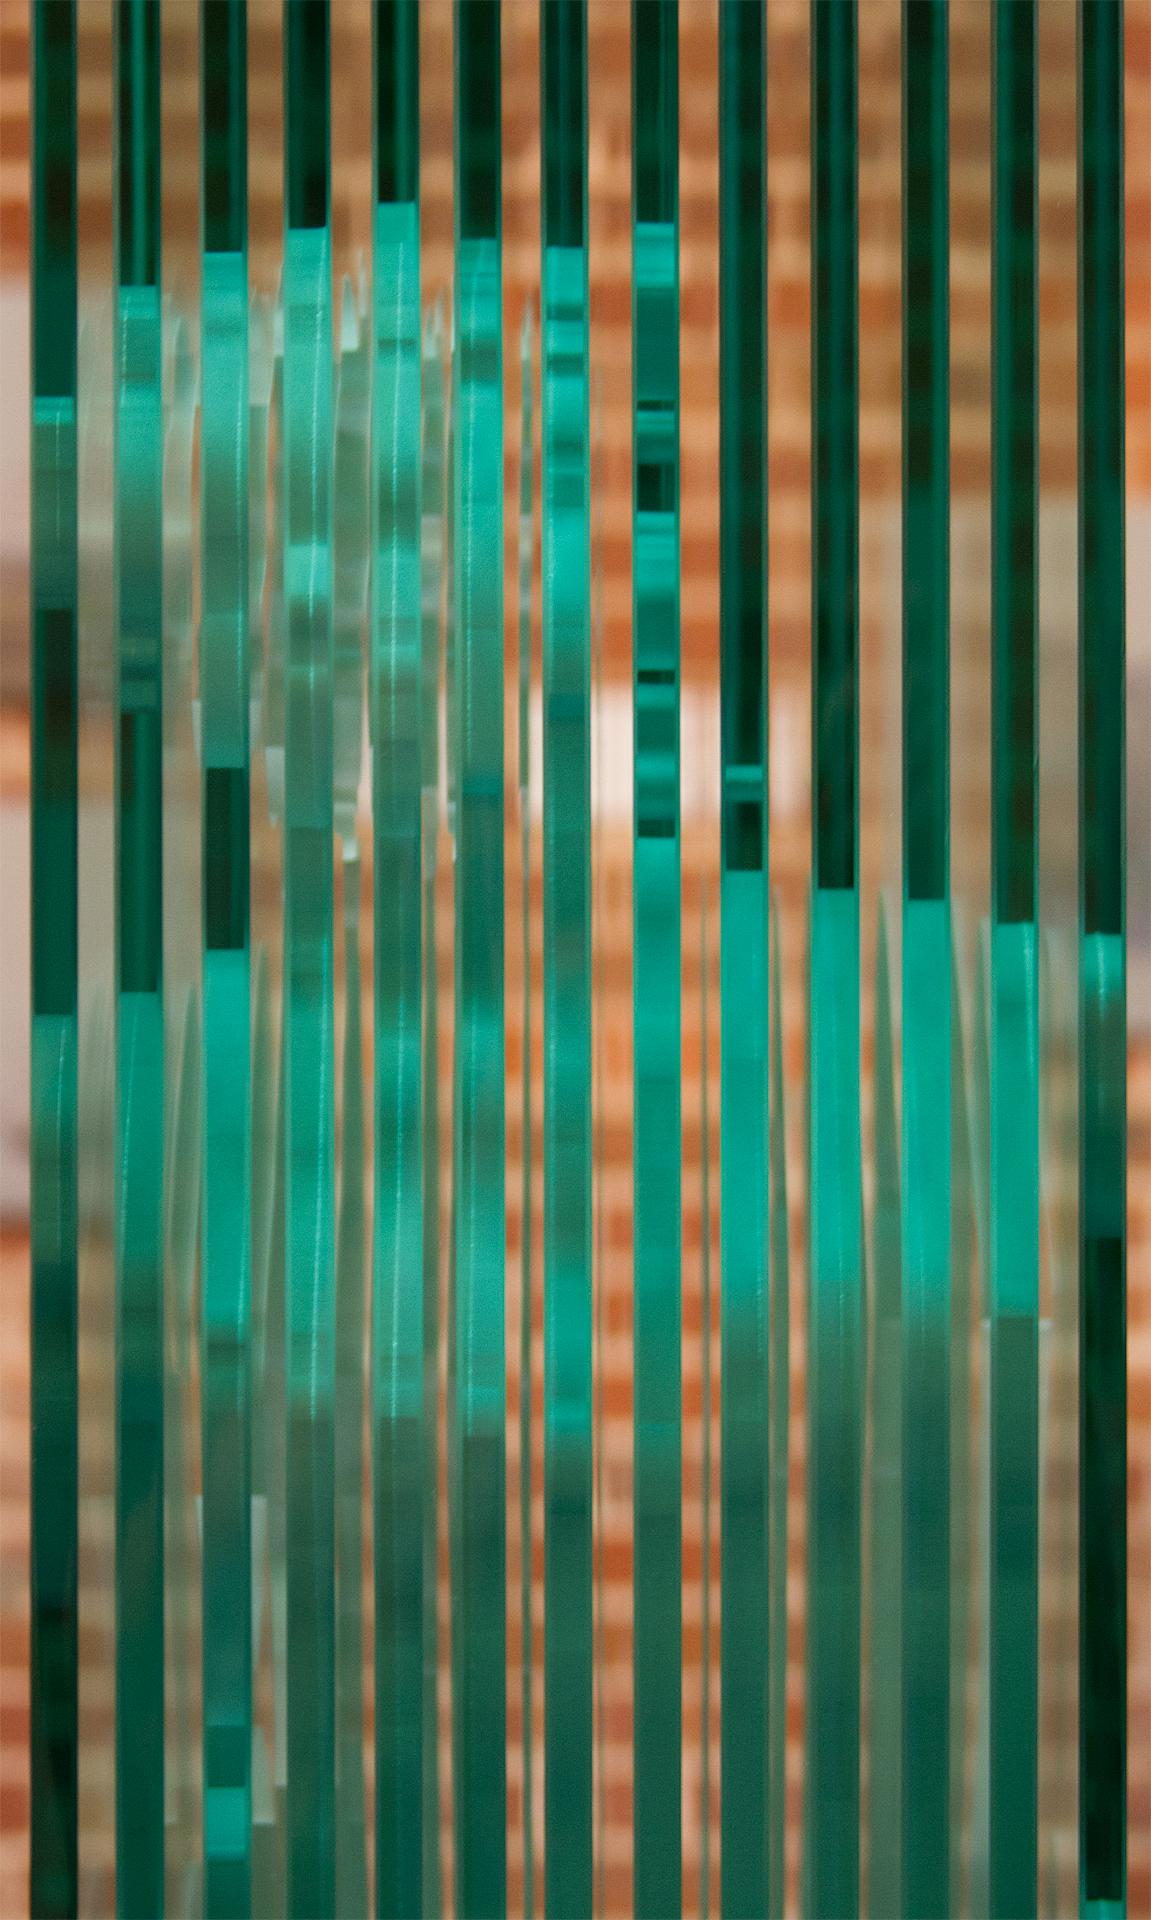 IMG_7562-Siren-Front-Edge-Closeup-x1920.jpg